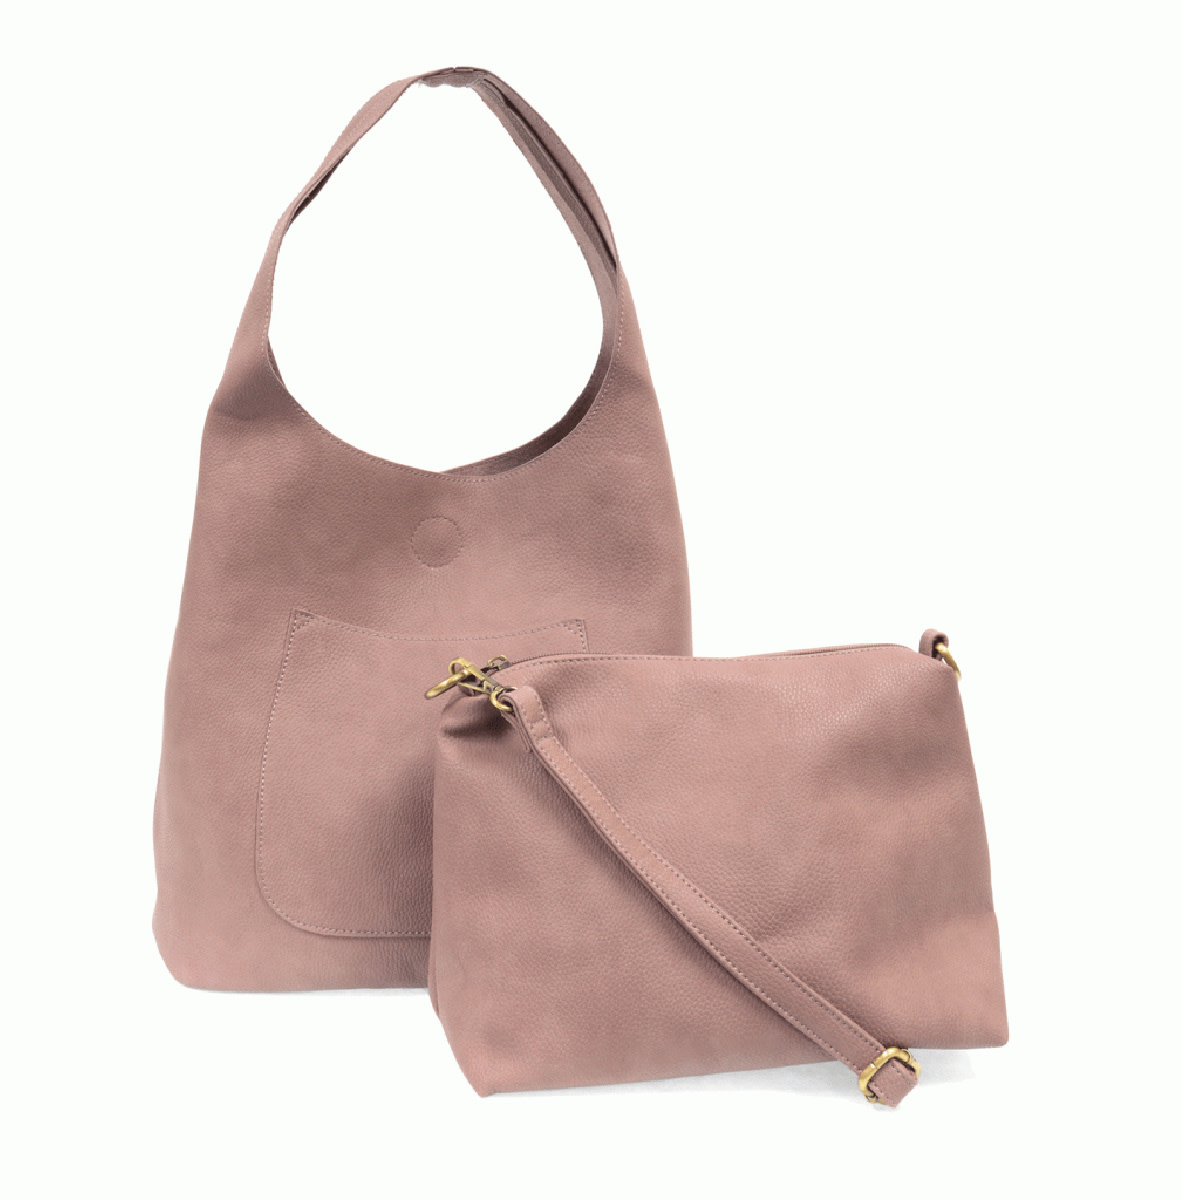 Joy Susan Joy Susan Molly Slouchy Hobo Handbag Dusty Amethyst